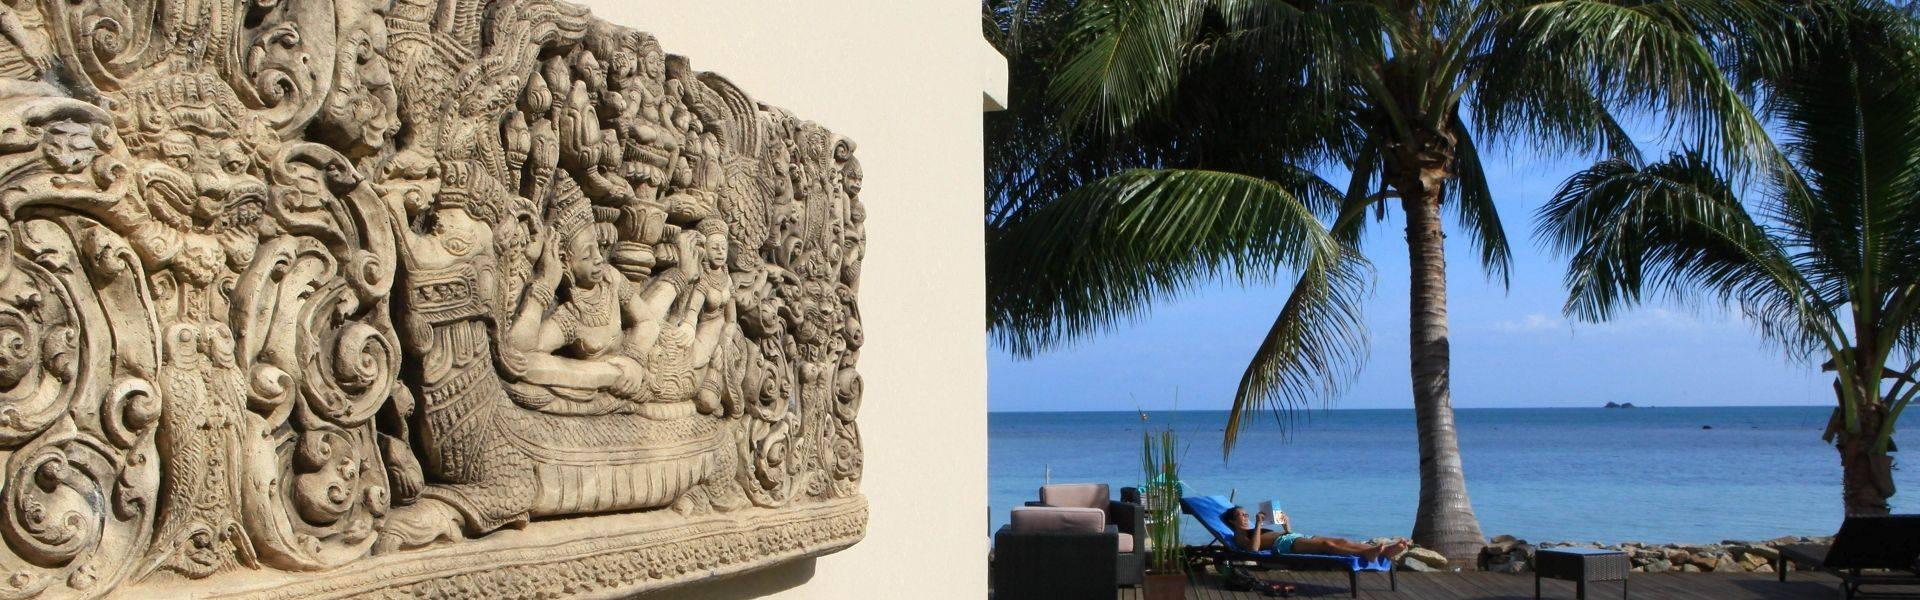 Samahita-Retreat-pool-sea-wall.jpg